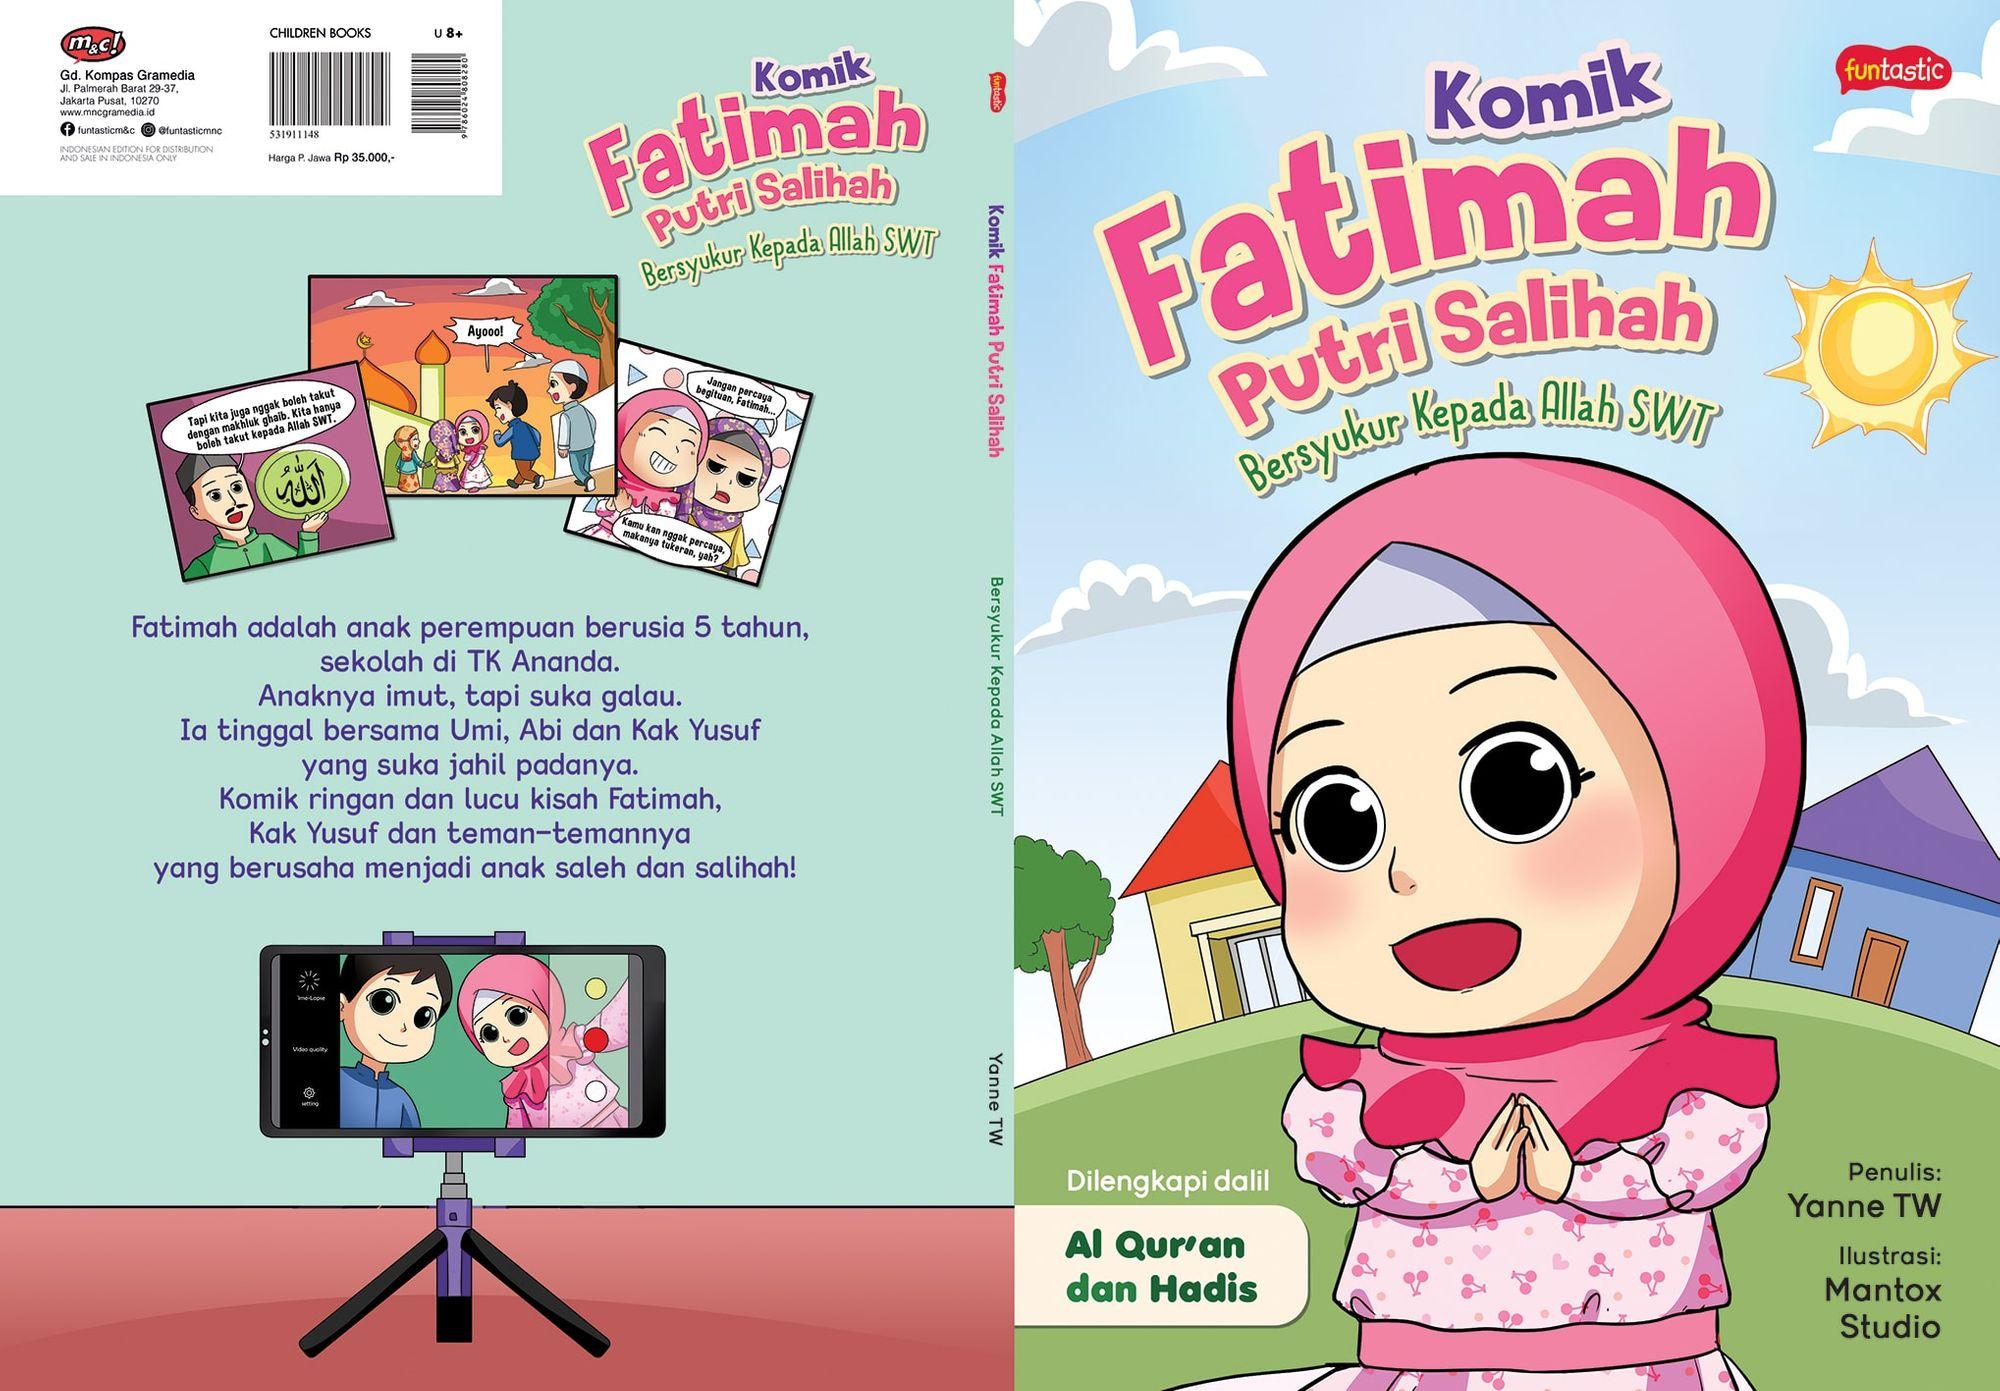 Komik Fatimah Putri Salihah: Komik Lokal Bernuansa Islami yang Mengajak Anak-Anak Menjadi Salih & Salihah